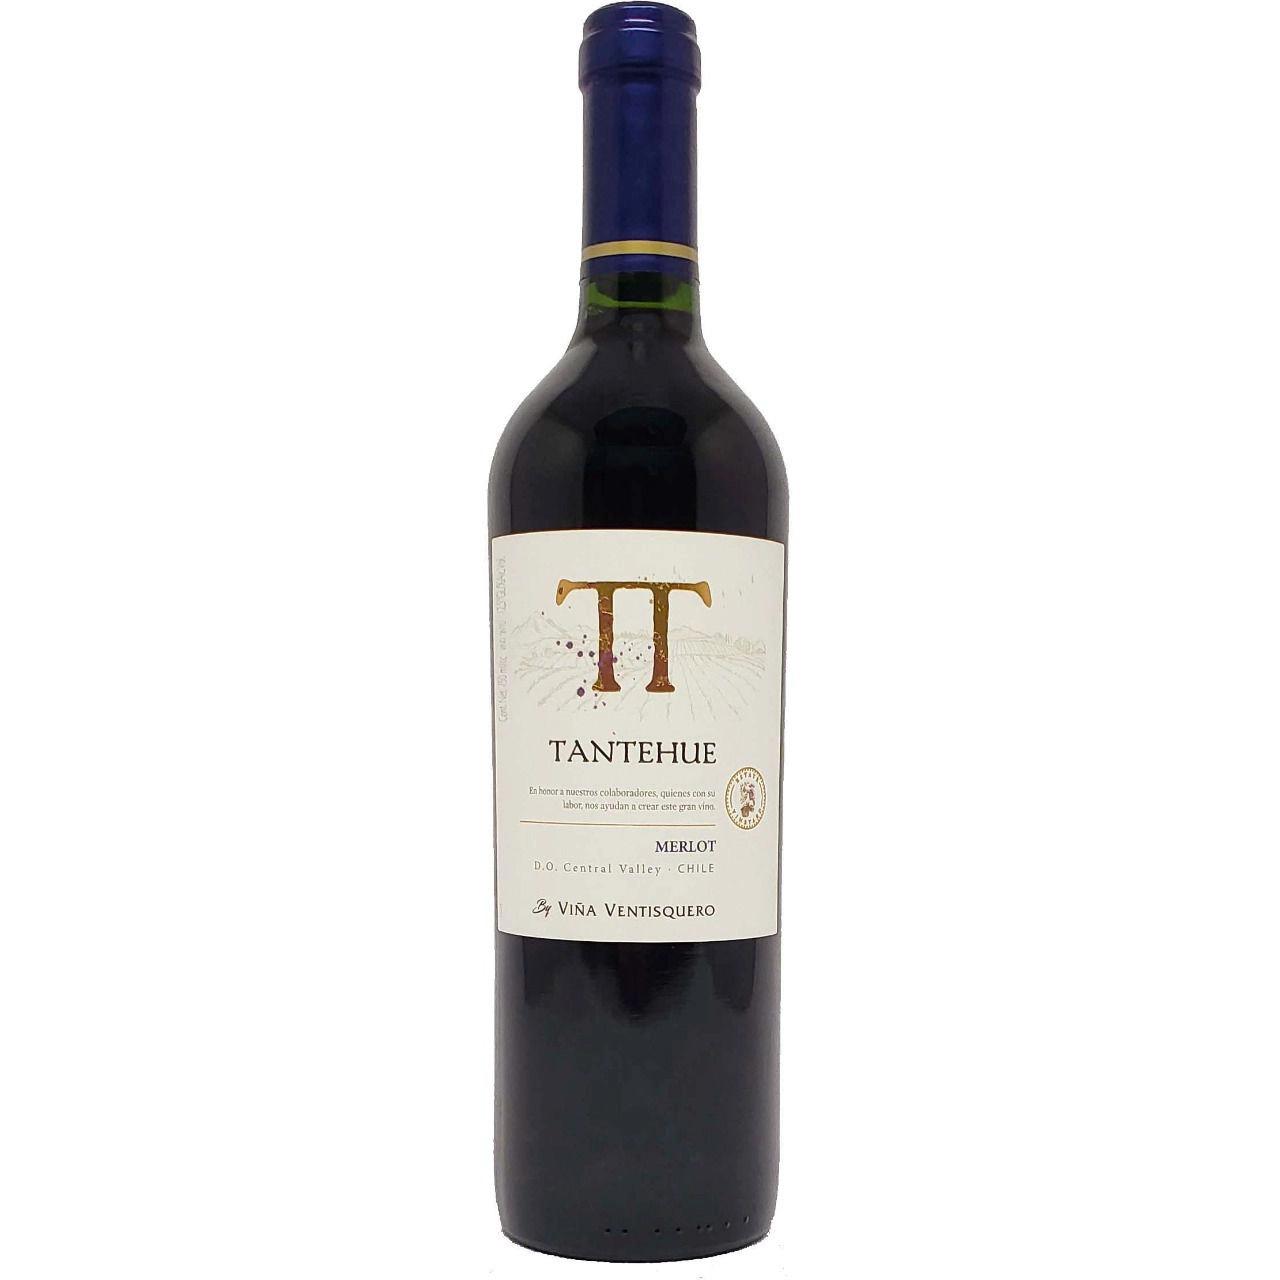 Vinho Tinto Chileno Tantehue Merlot 750ml 2020